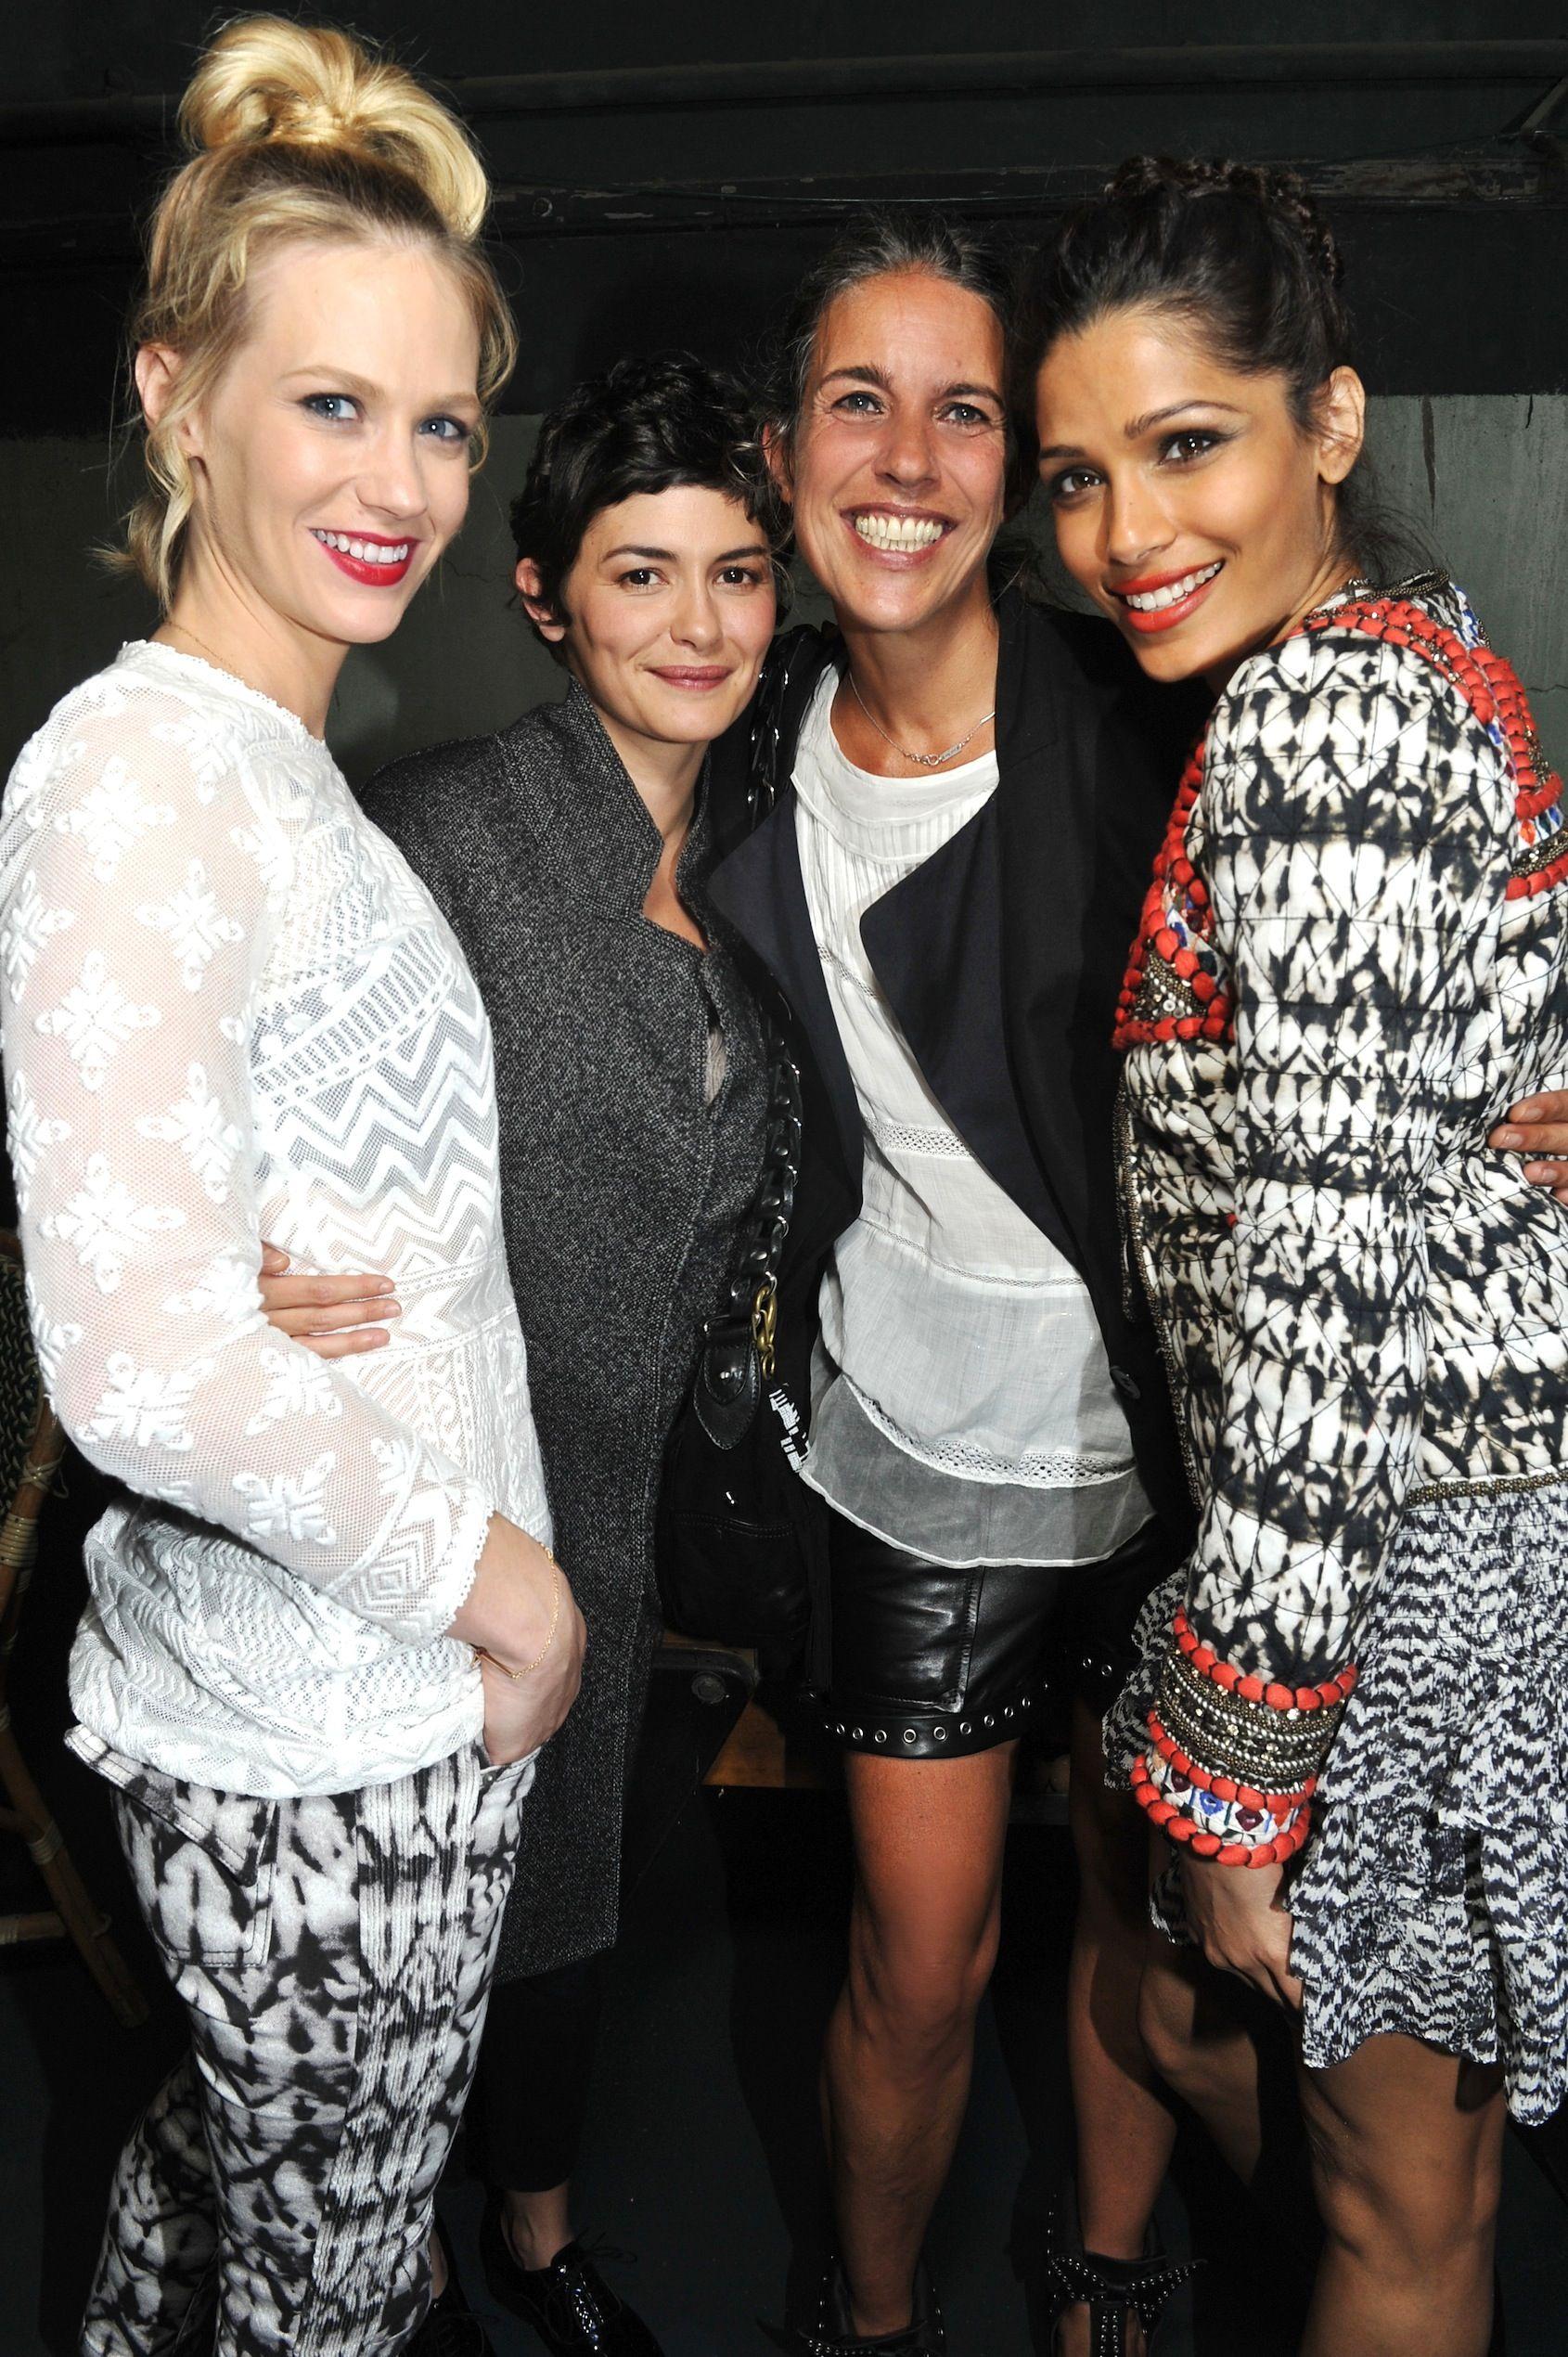 January Jones, Audrey Tautou, Isabel Marant, Freida Pinto wearing #isabelmarant for h&m